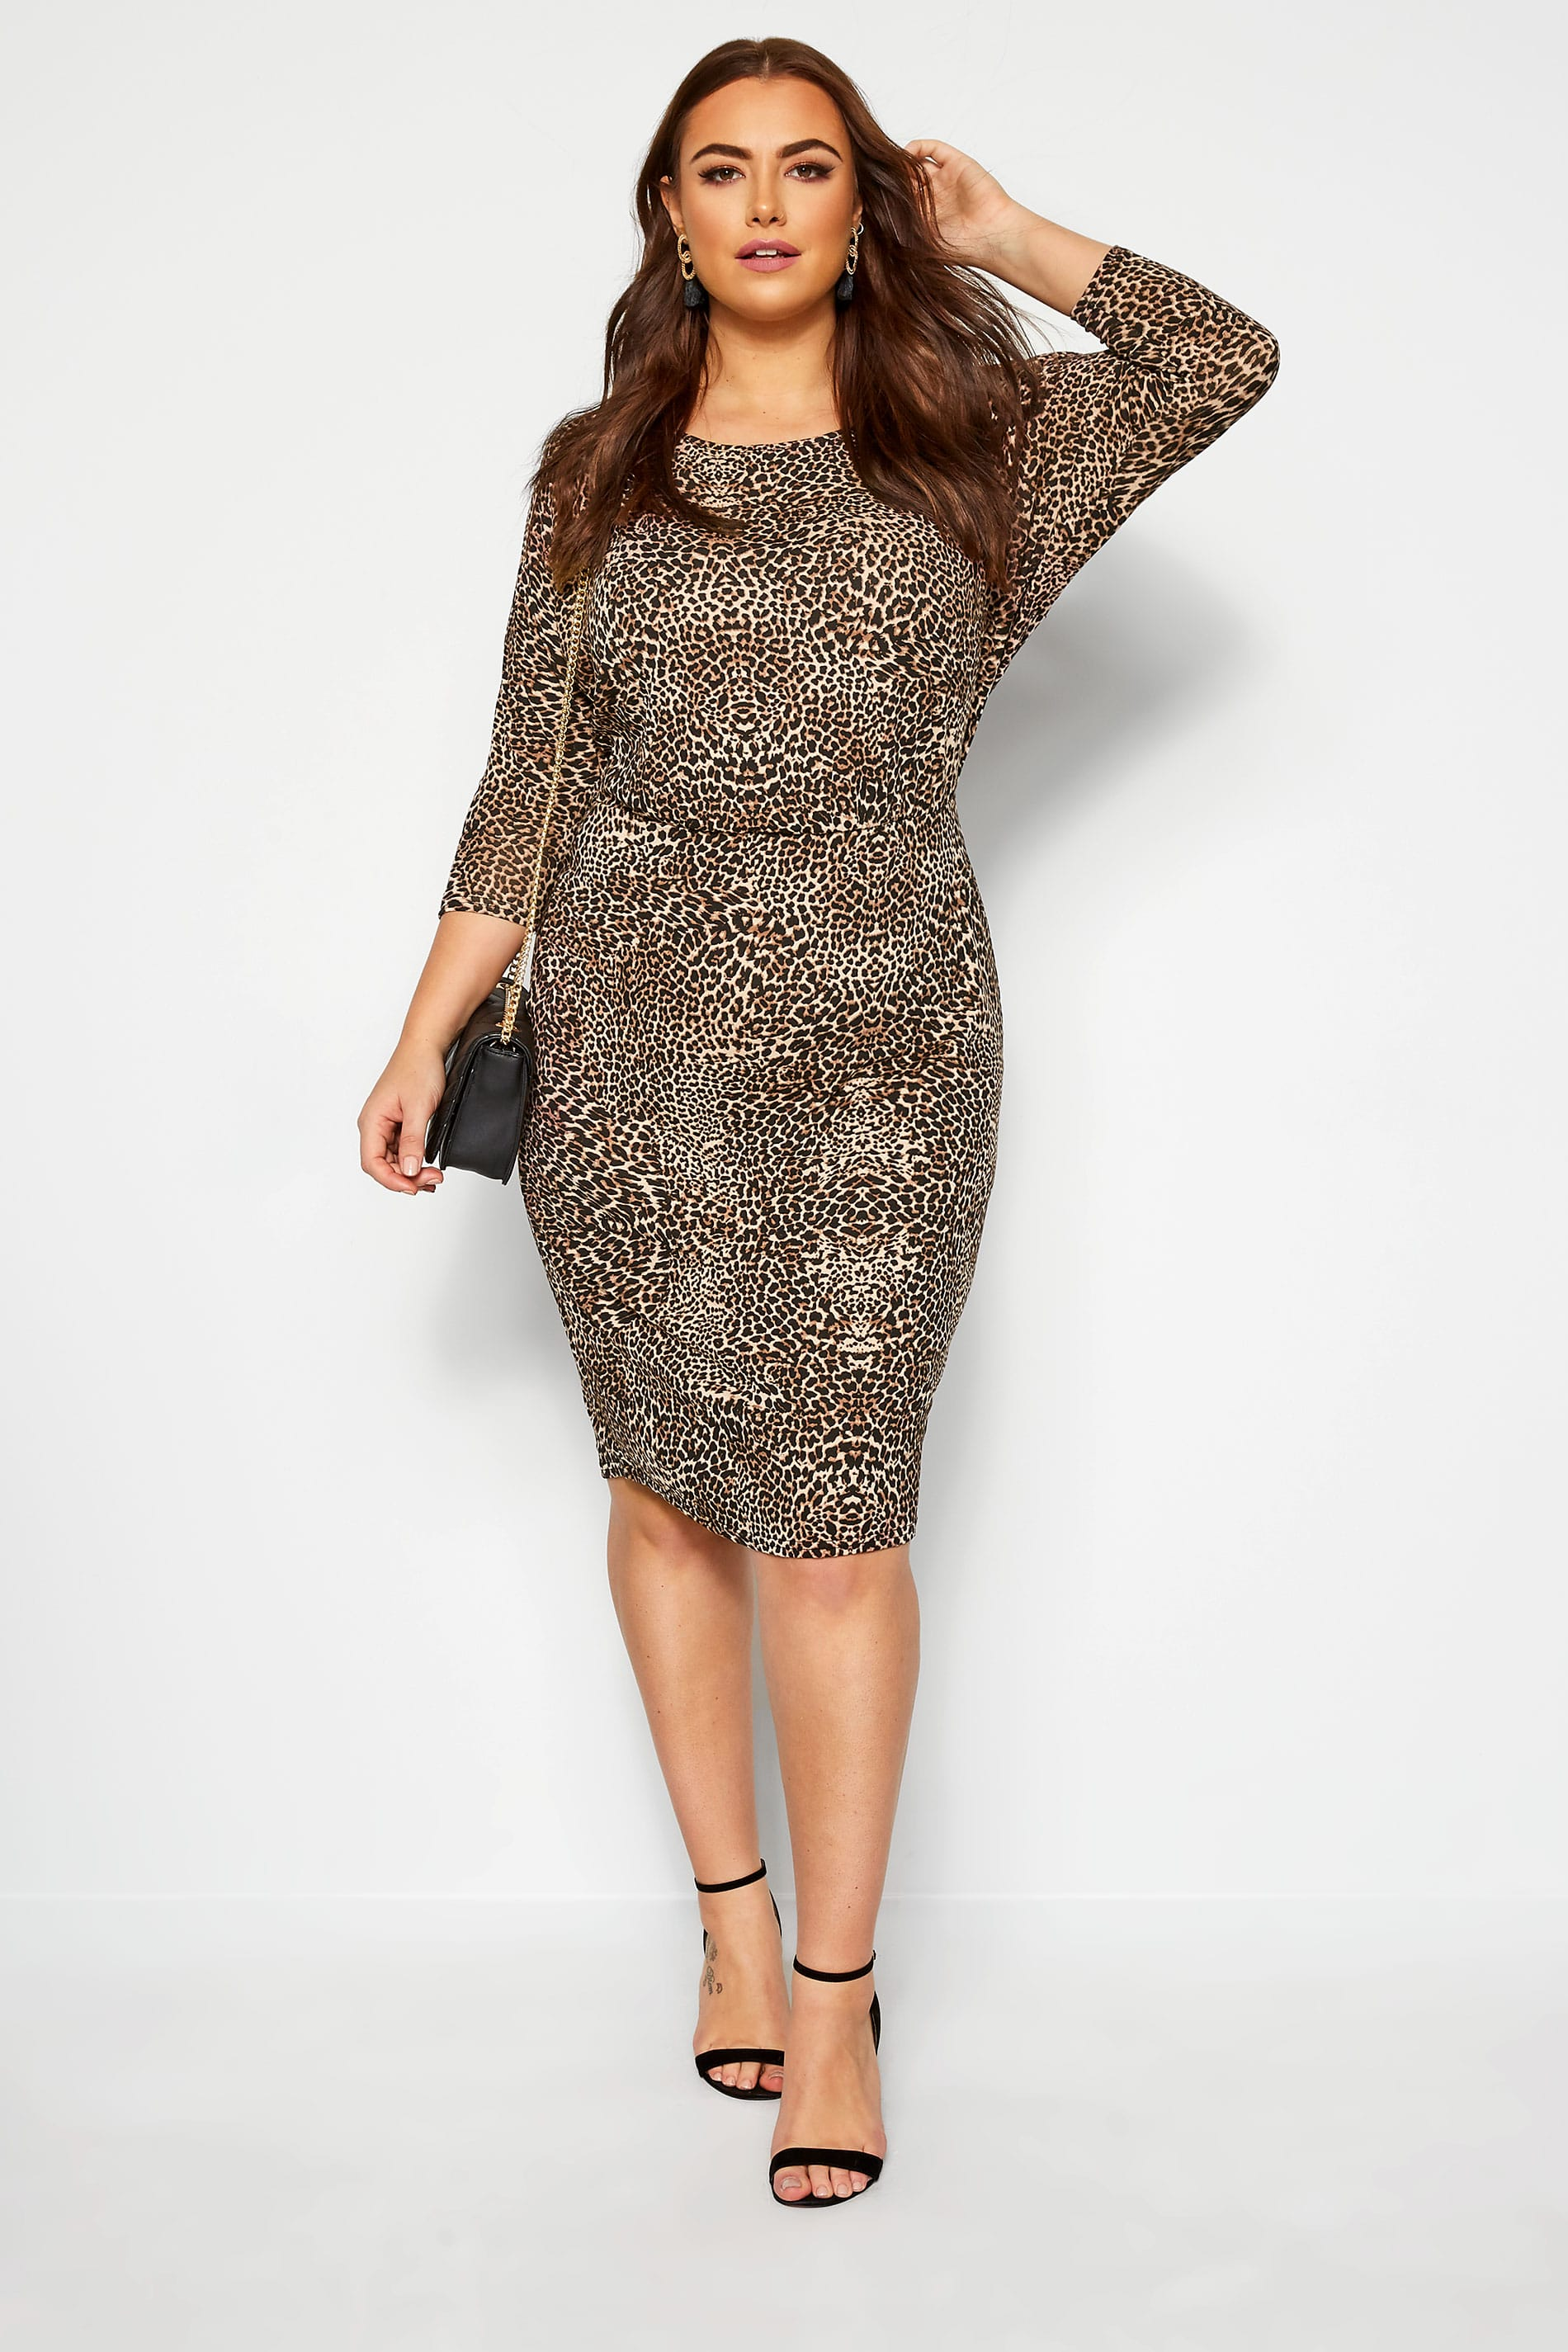 Brown Animal Print Bodycon Dress